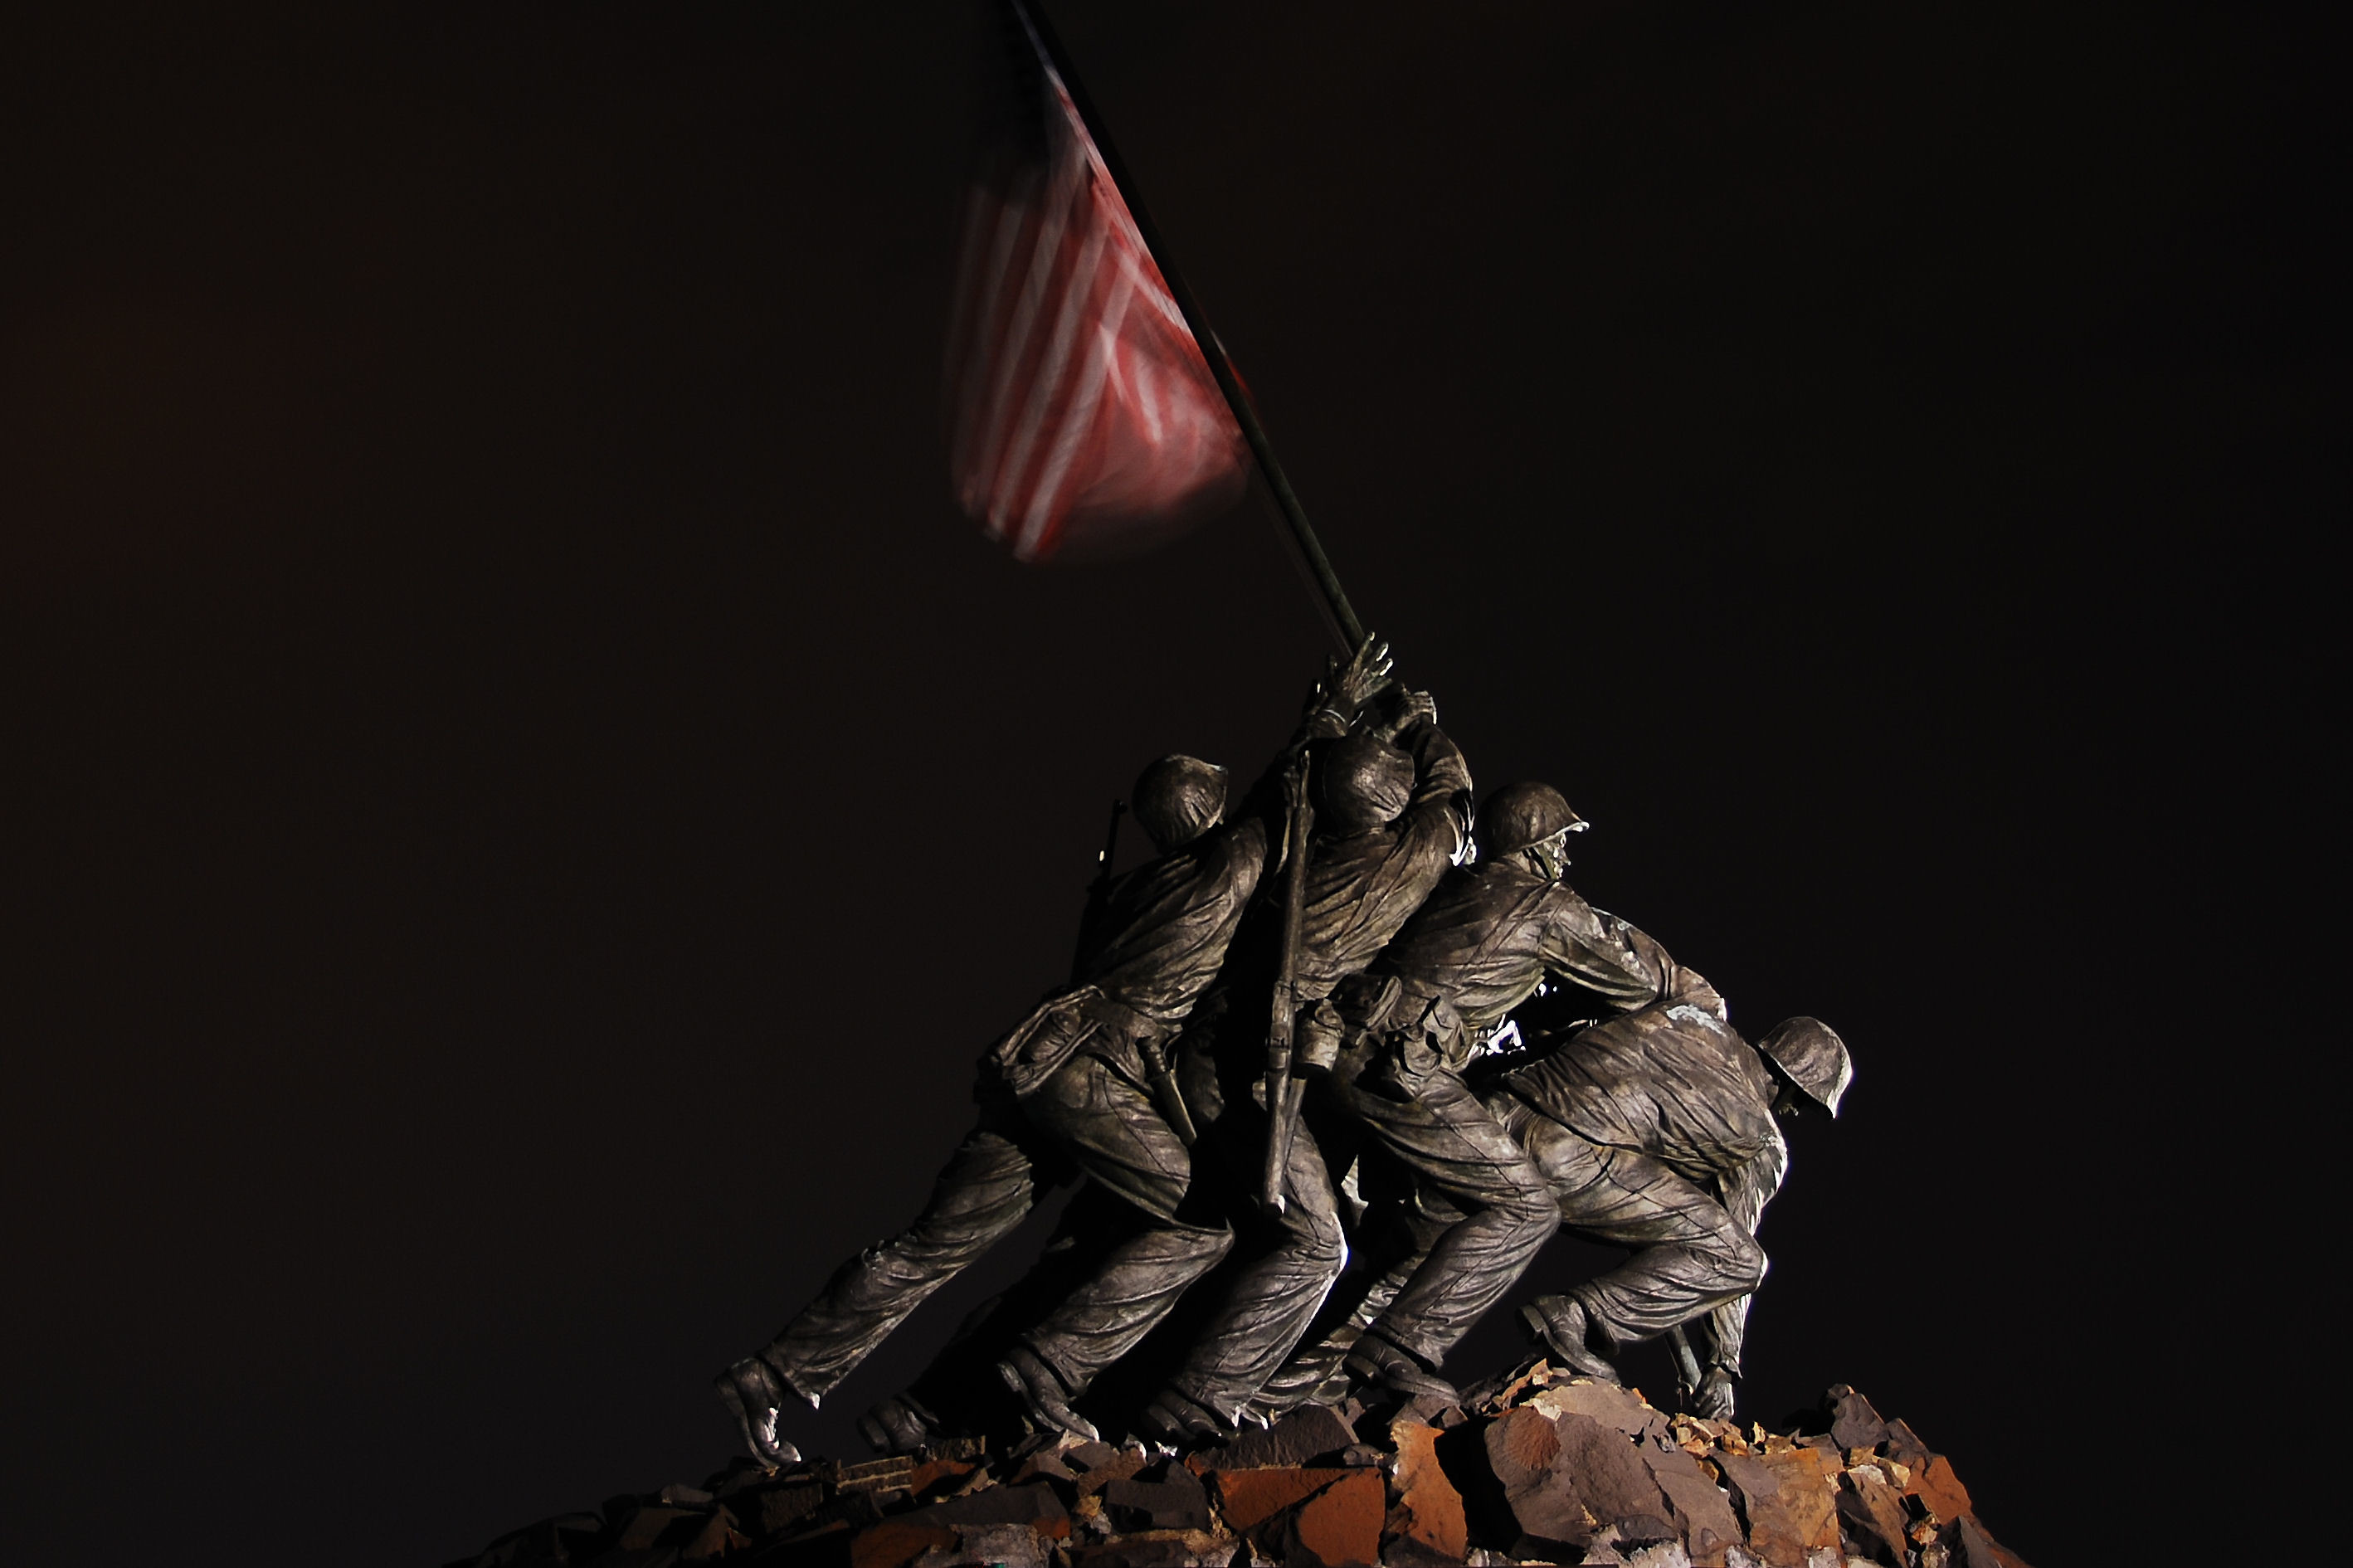 HD Wallpaper of Free Marine Corps Screensavers, Desktop Wallpaper Free Marine  Corps Screensavers